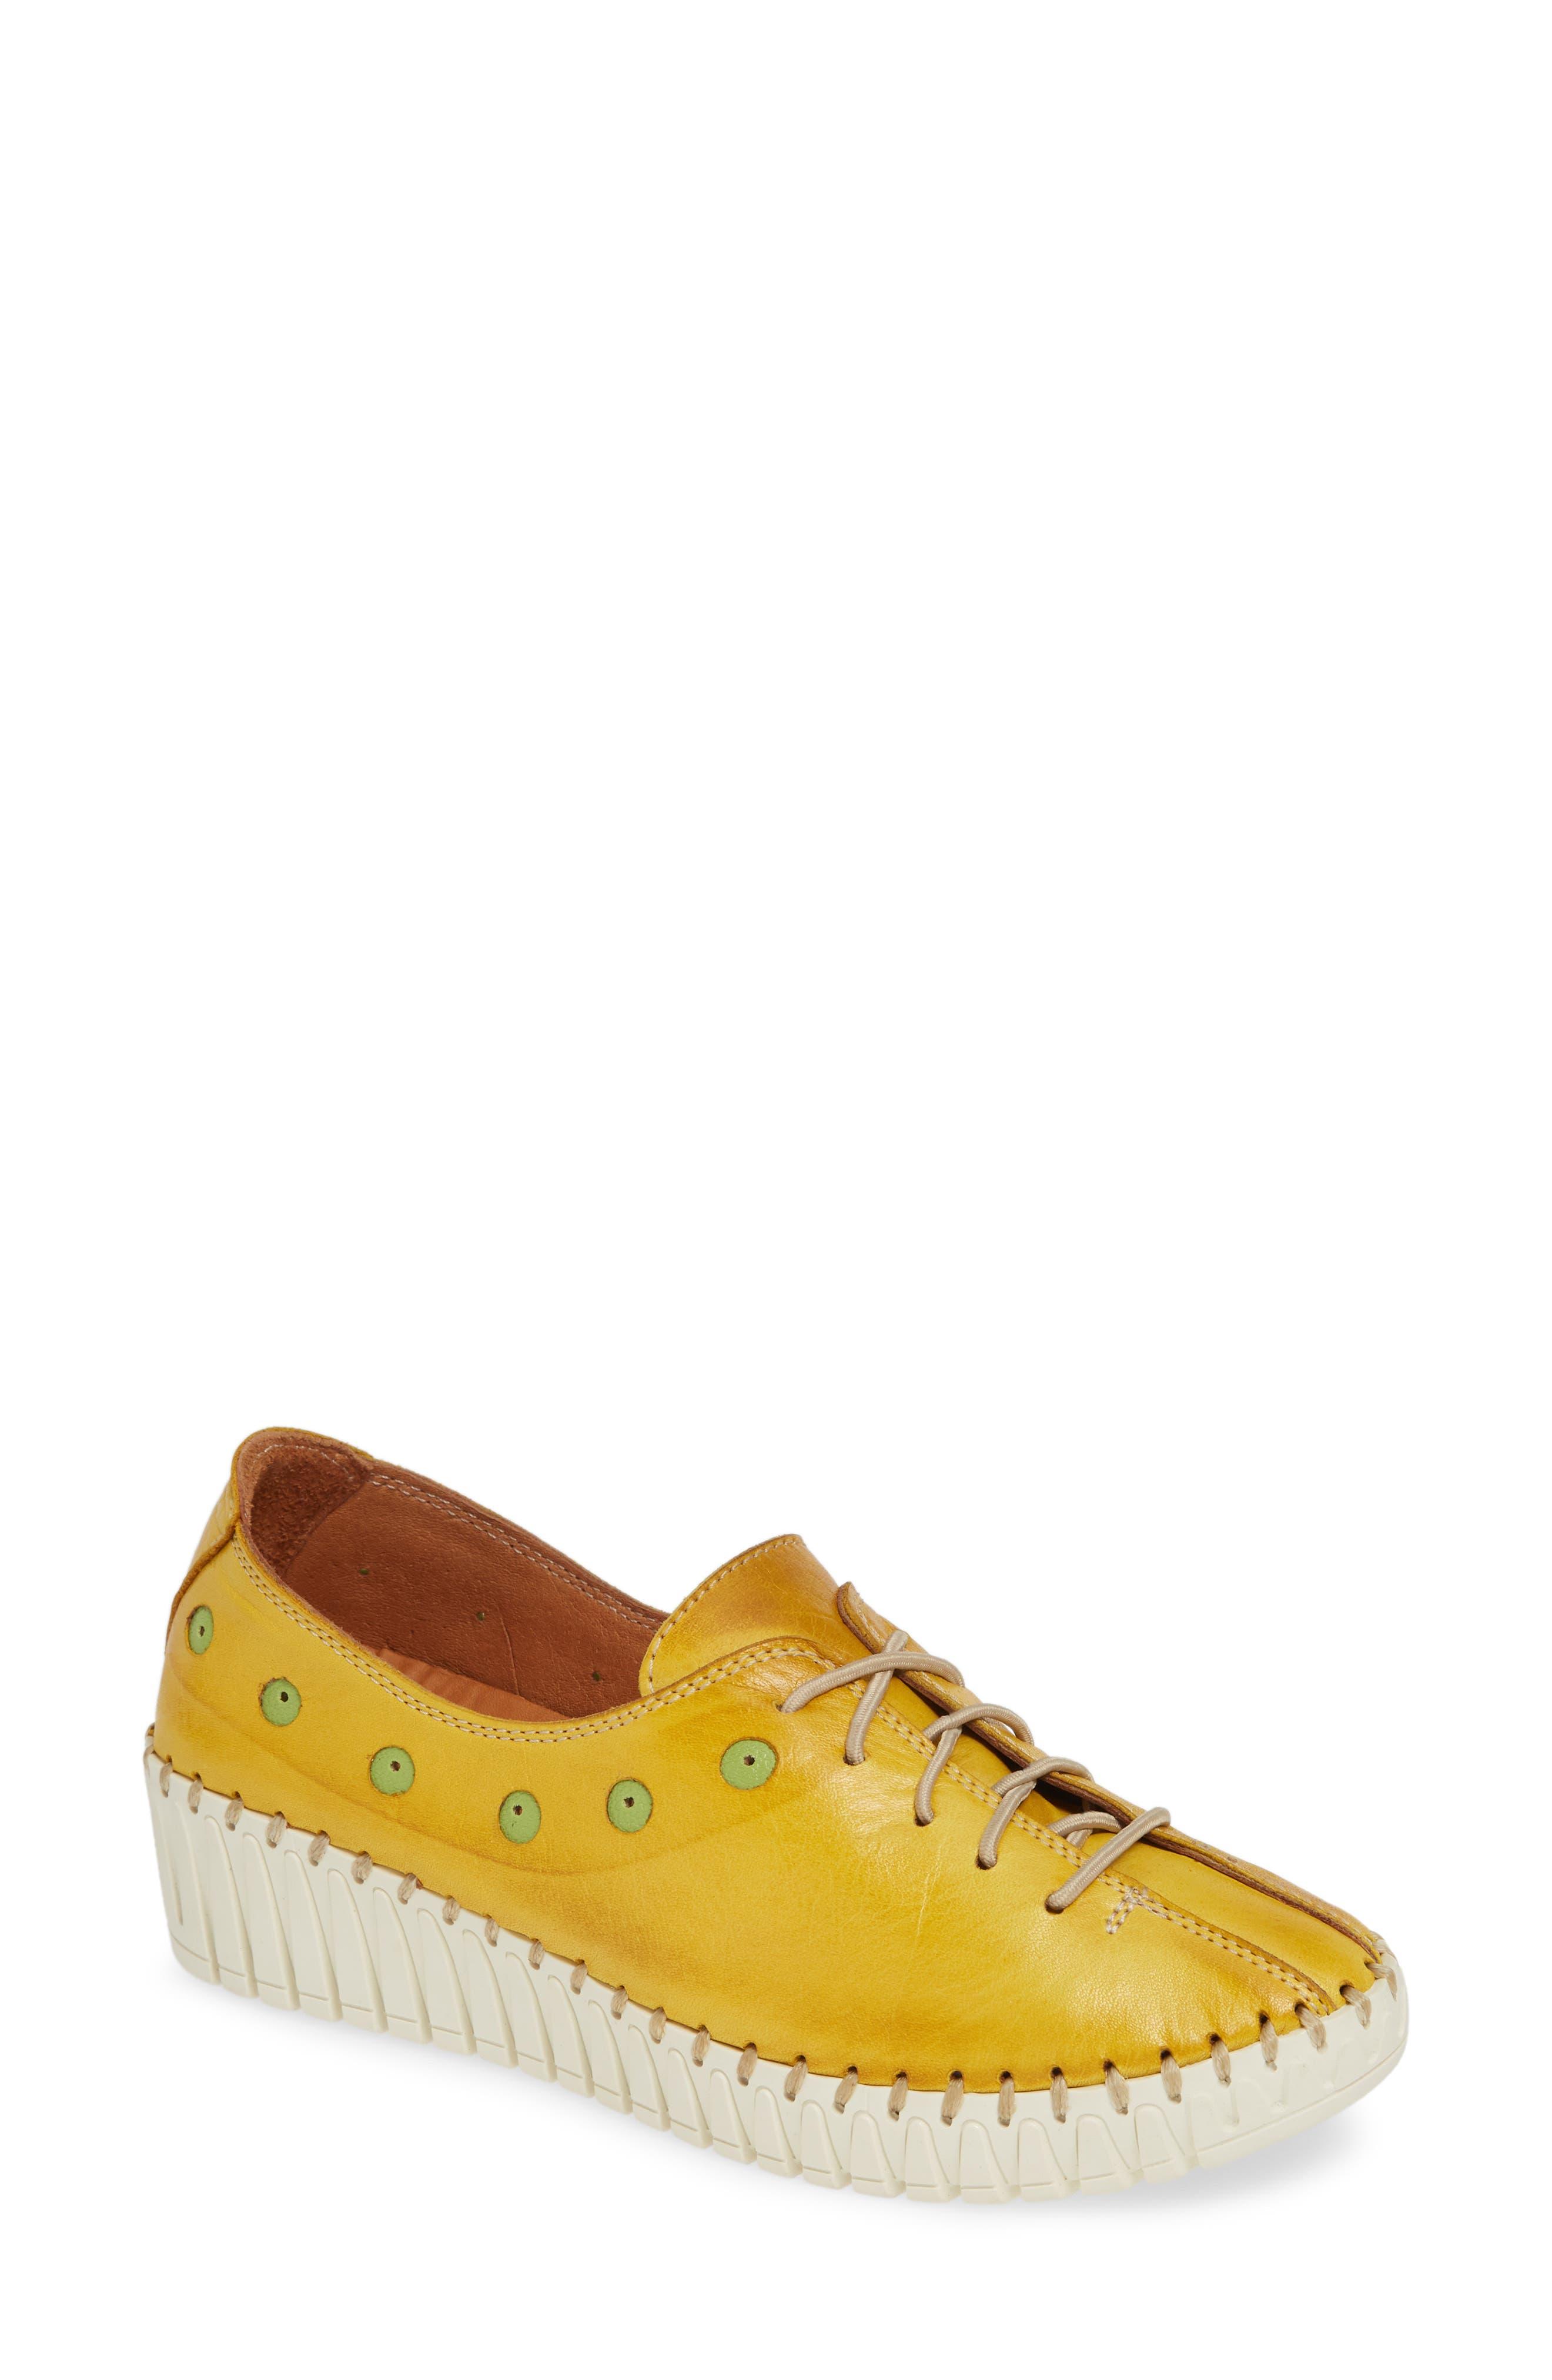 Sheridan Mia Kyle Sneaker - Yellow